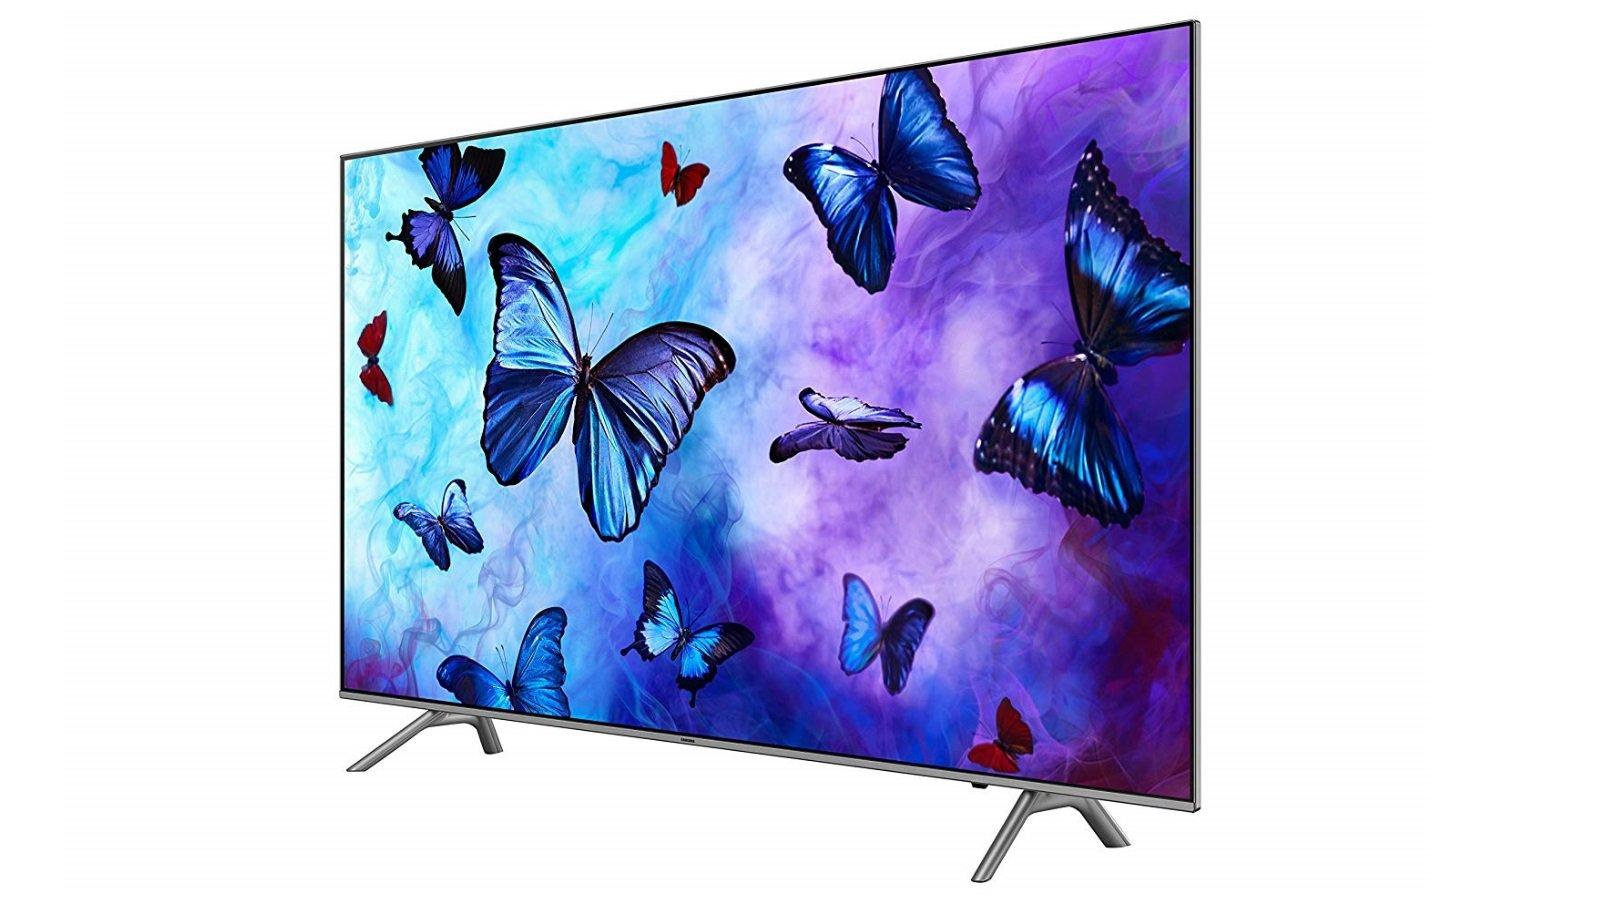 987d7e2f9eb Best UK TV deals  The best cheap Smart TVs in the April sales ...